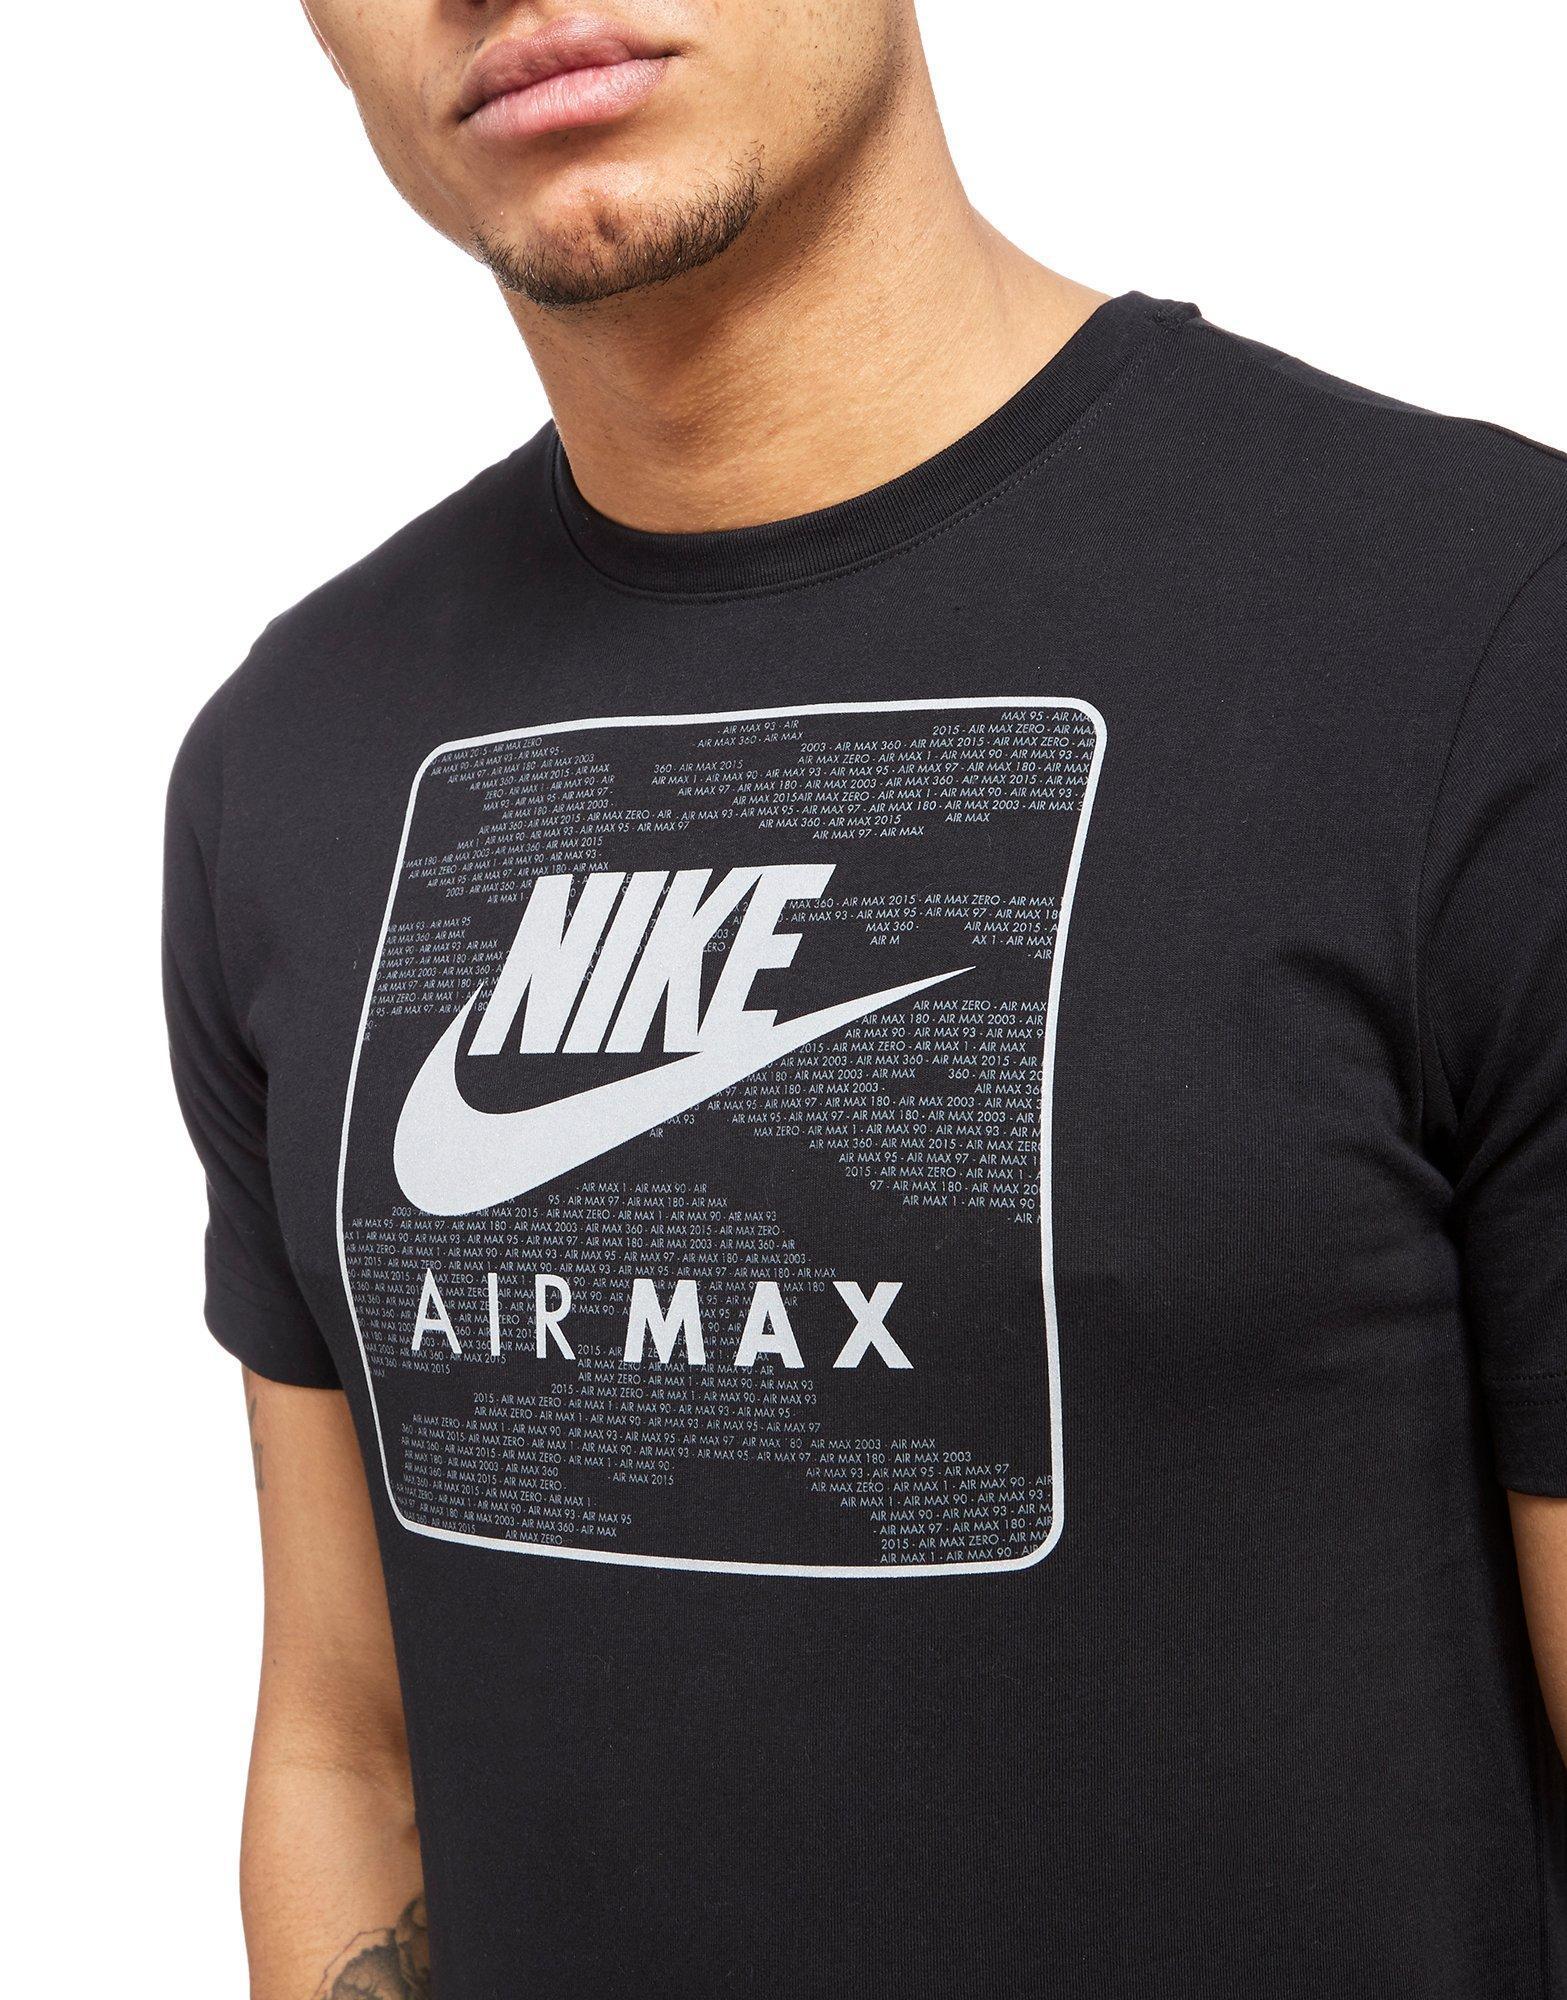 de18d085 Nike Air Max Graphic T-shirt in Black for Men - Lyst